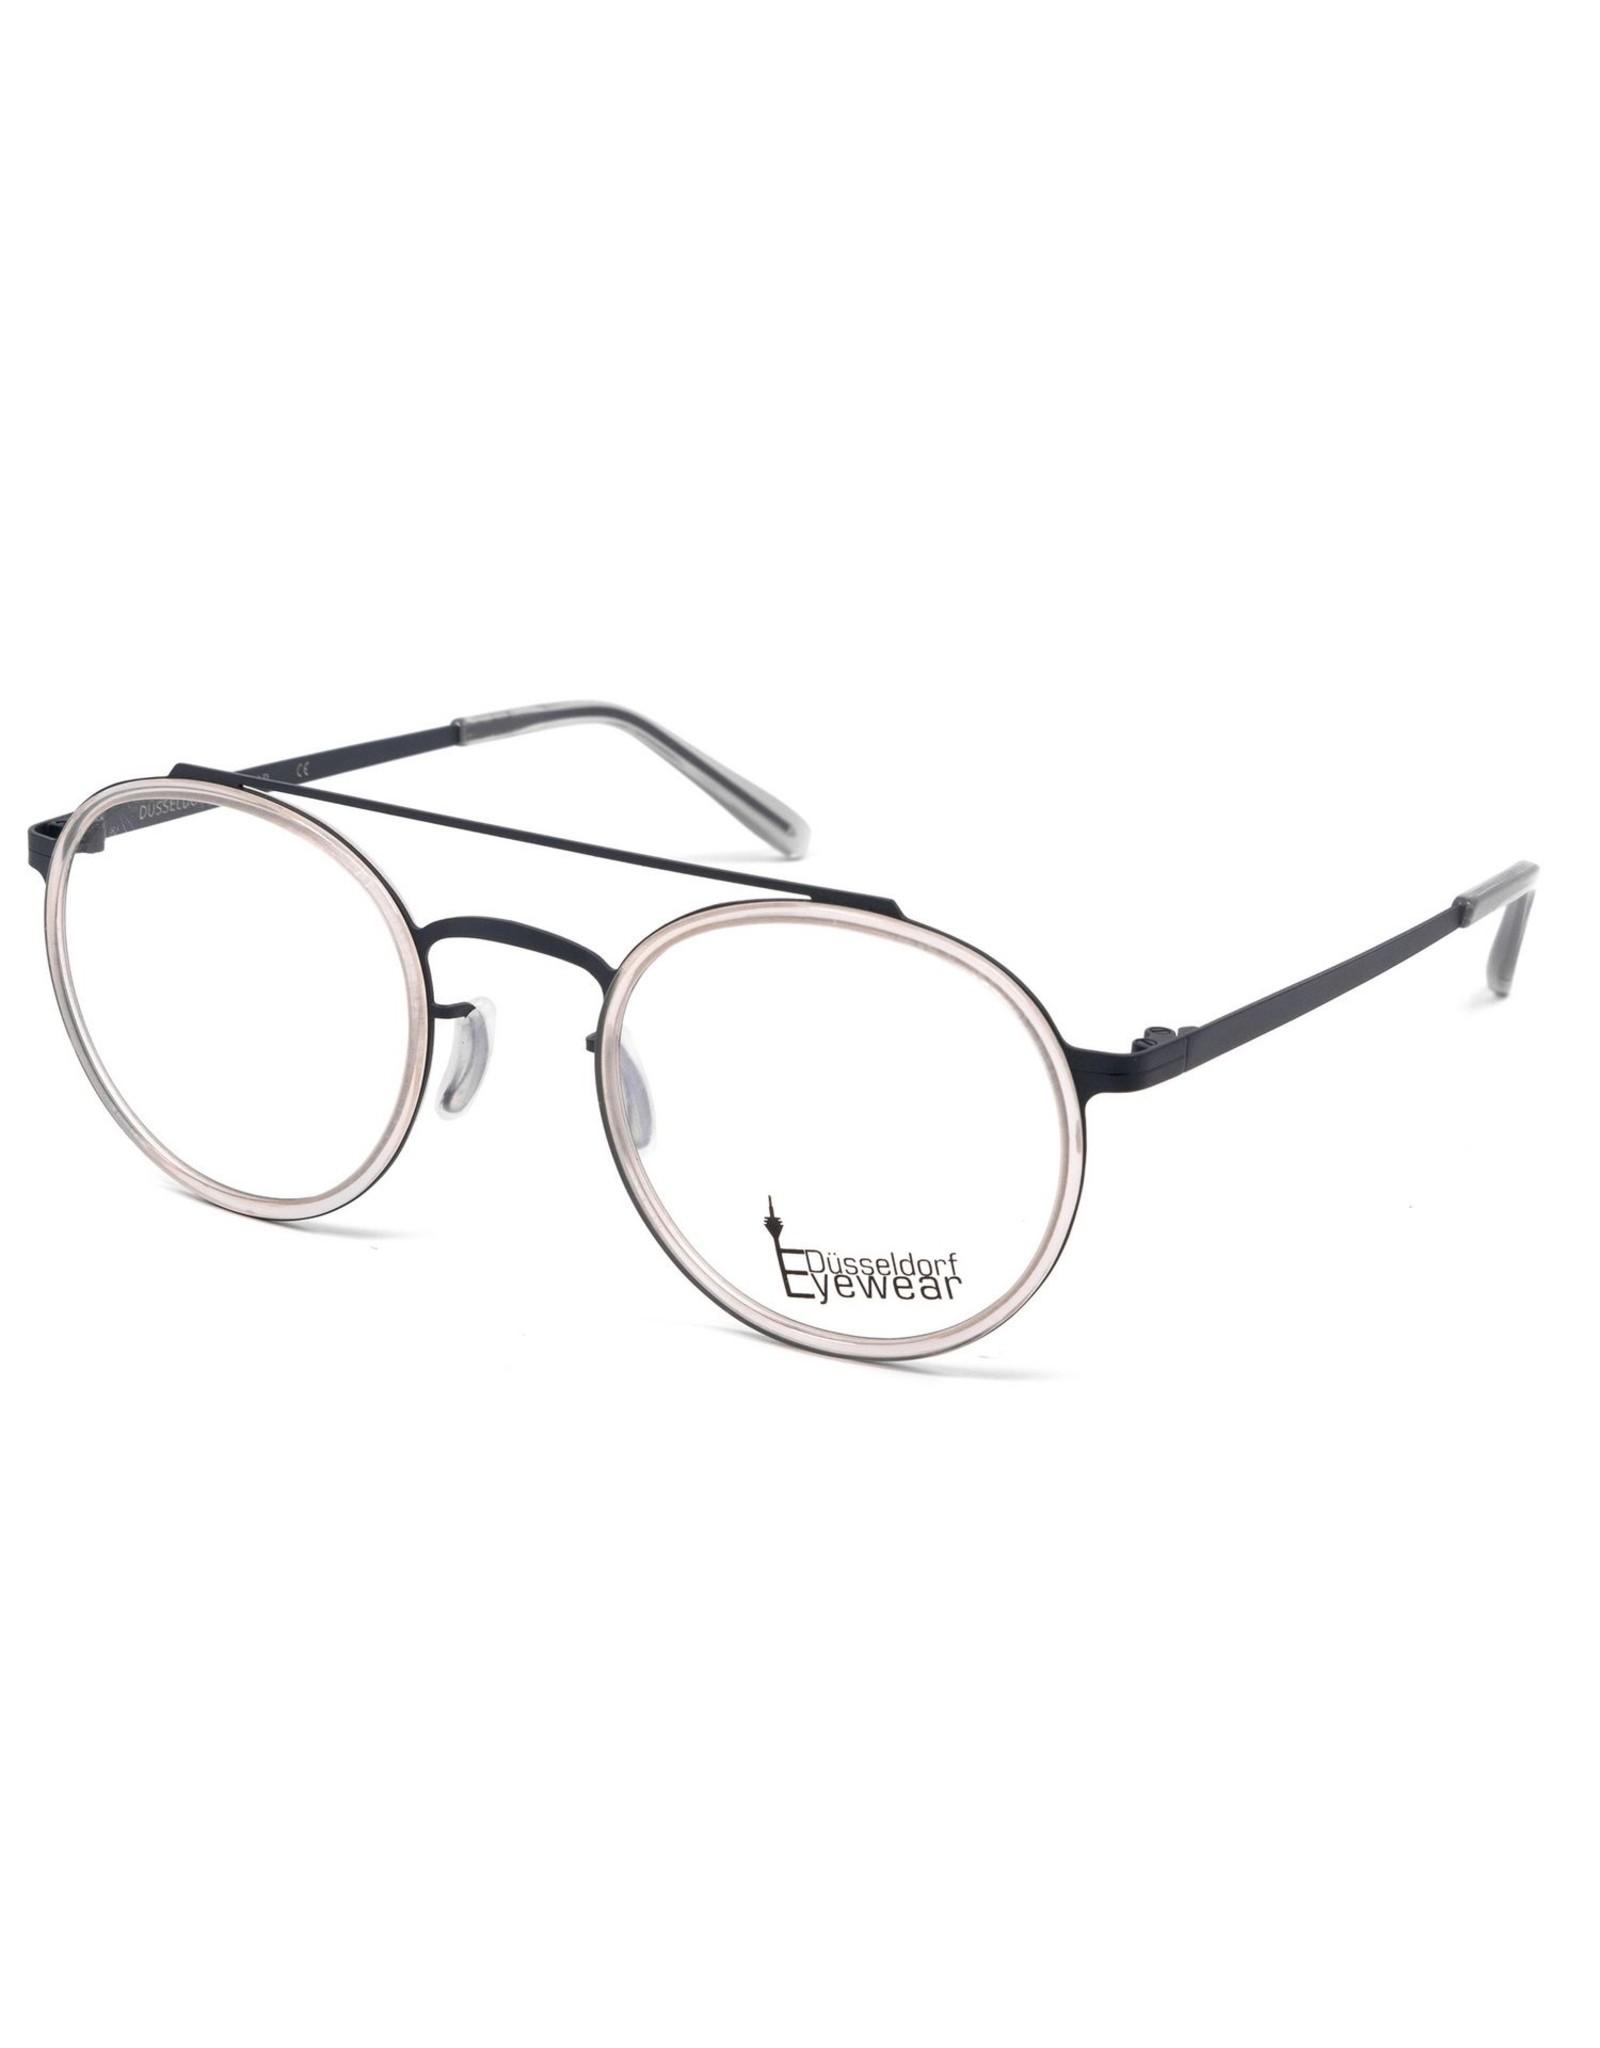 Dusselorf Eyewear Dusseldorf Eyewear Lessingplatz gris blue